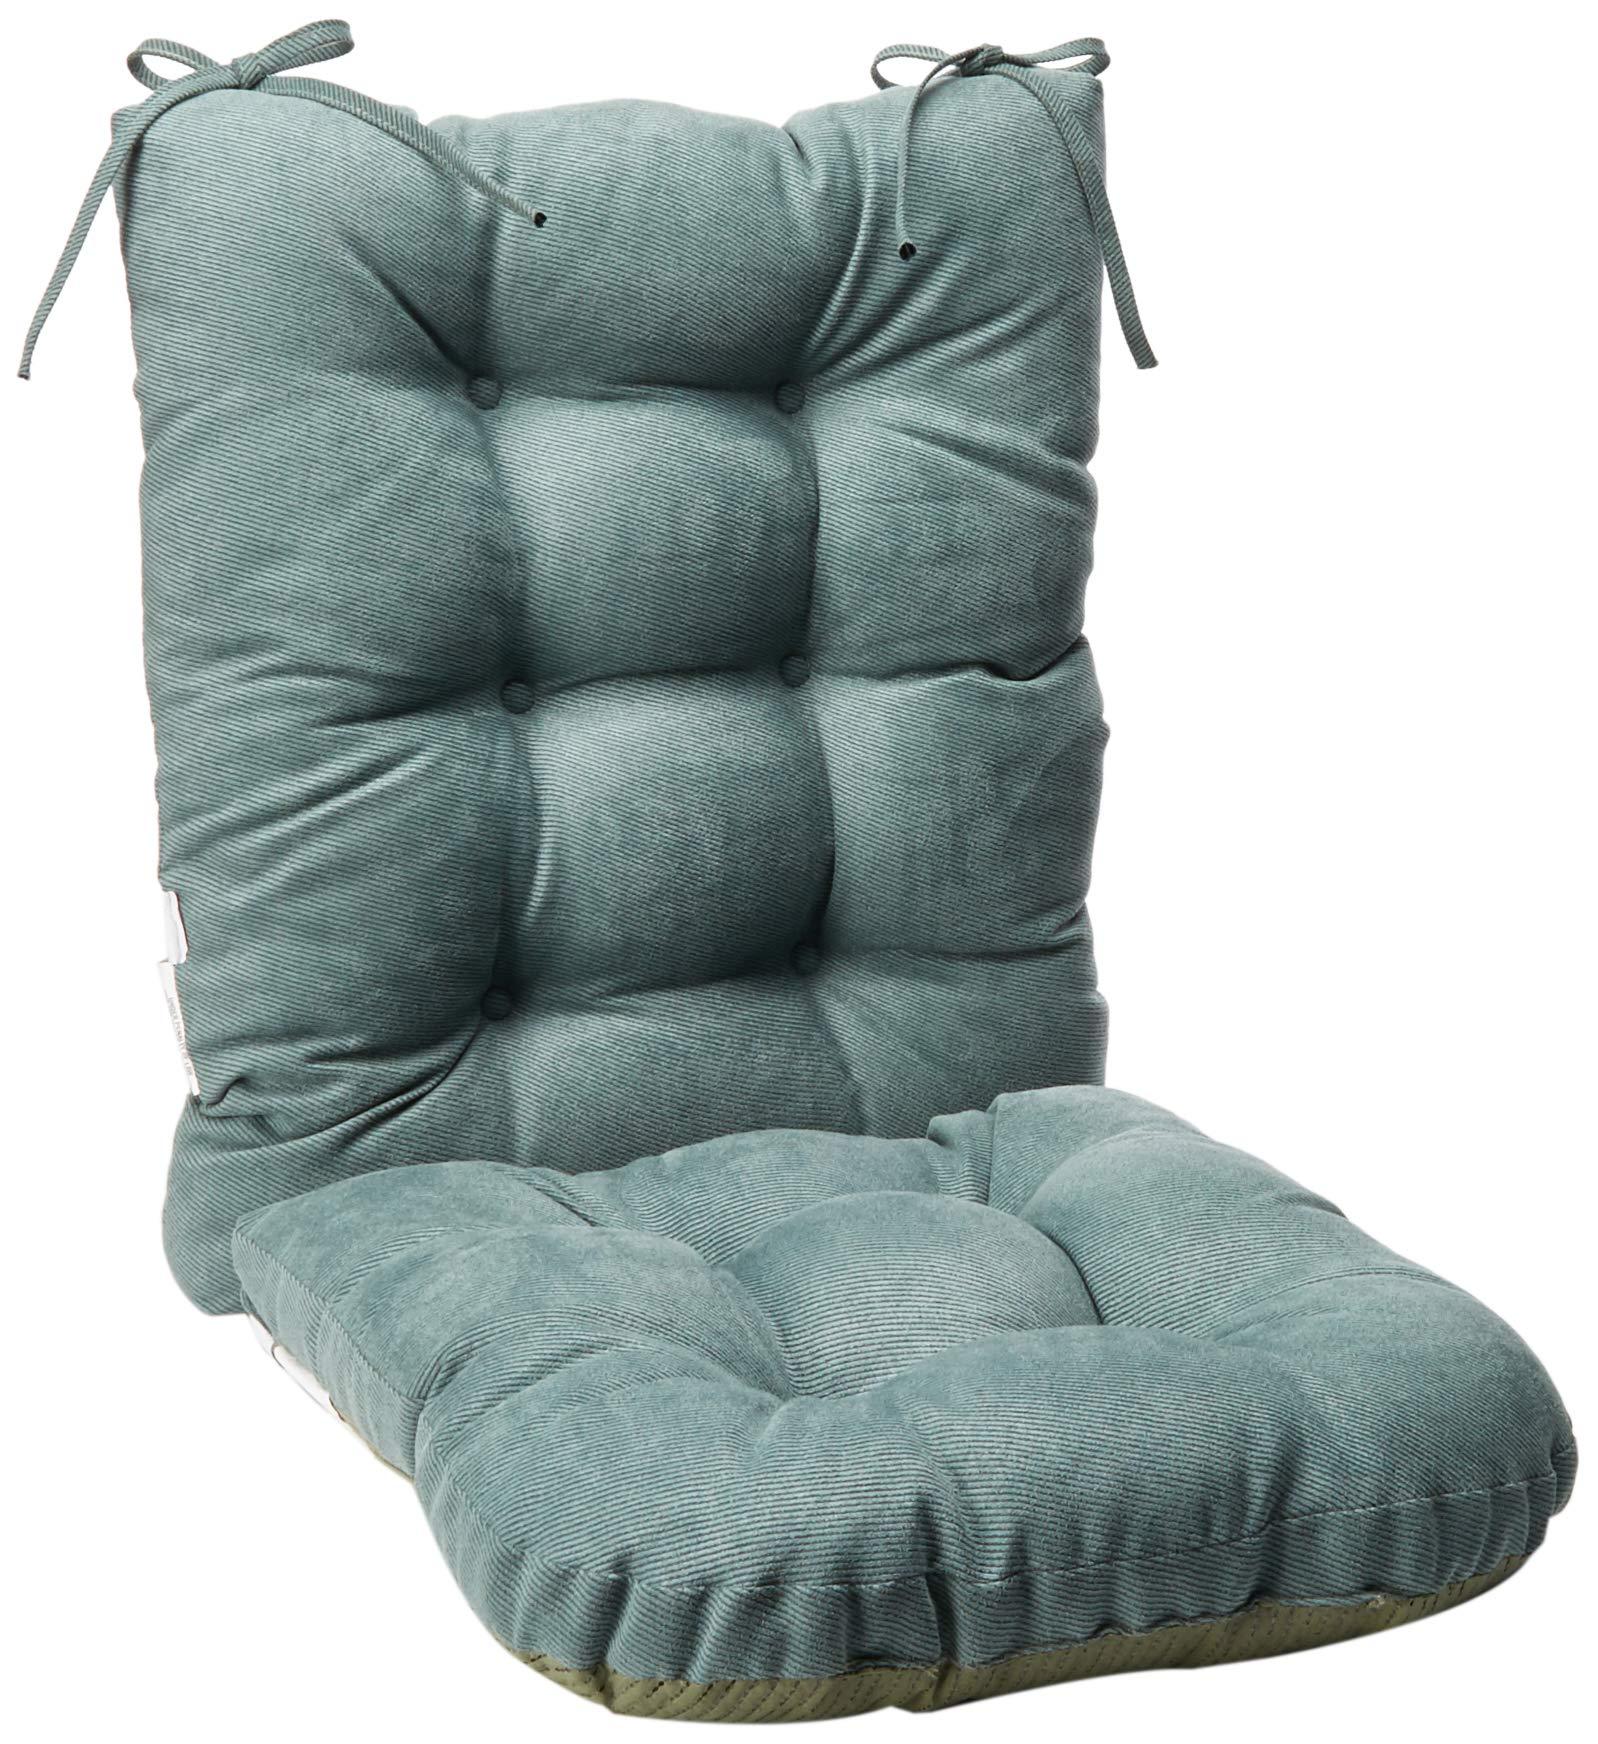 Klear Vu Twill Rocking Chair Pad Set, 17 x 17 x 3 inches, Marine